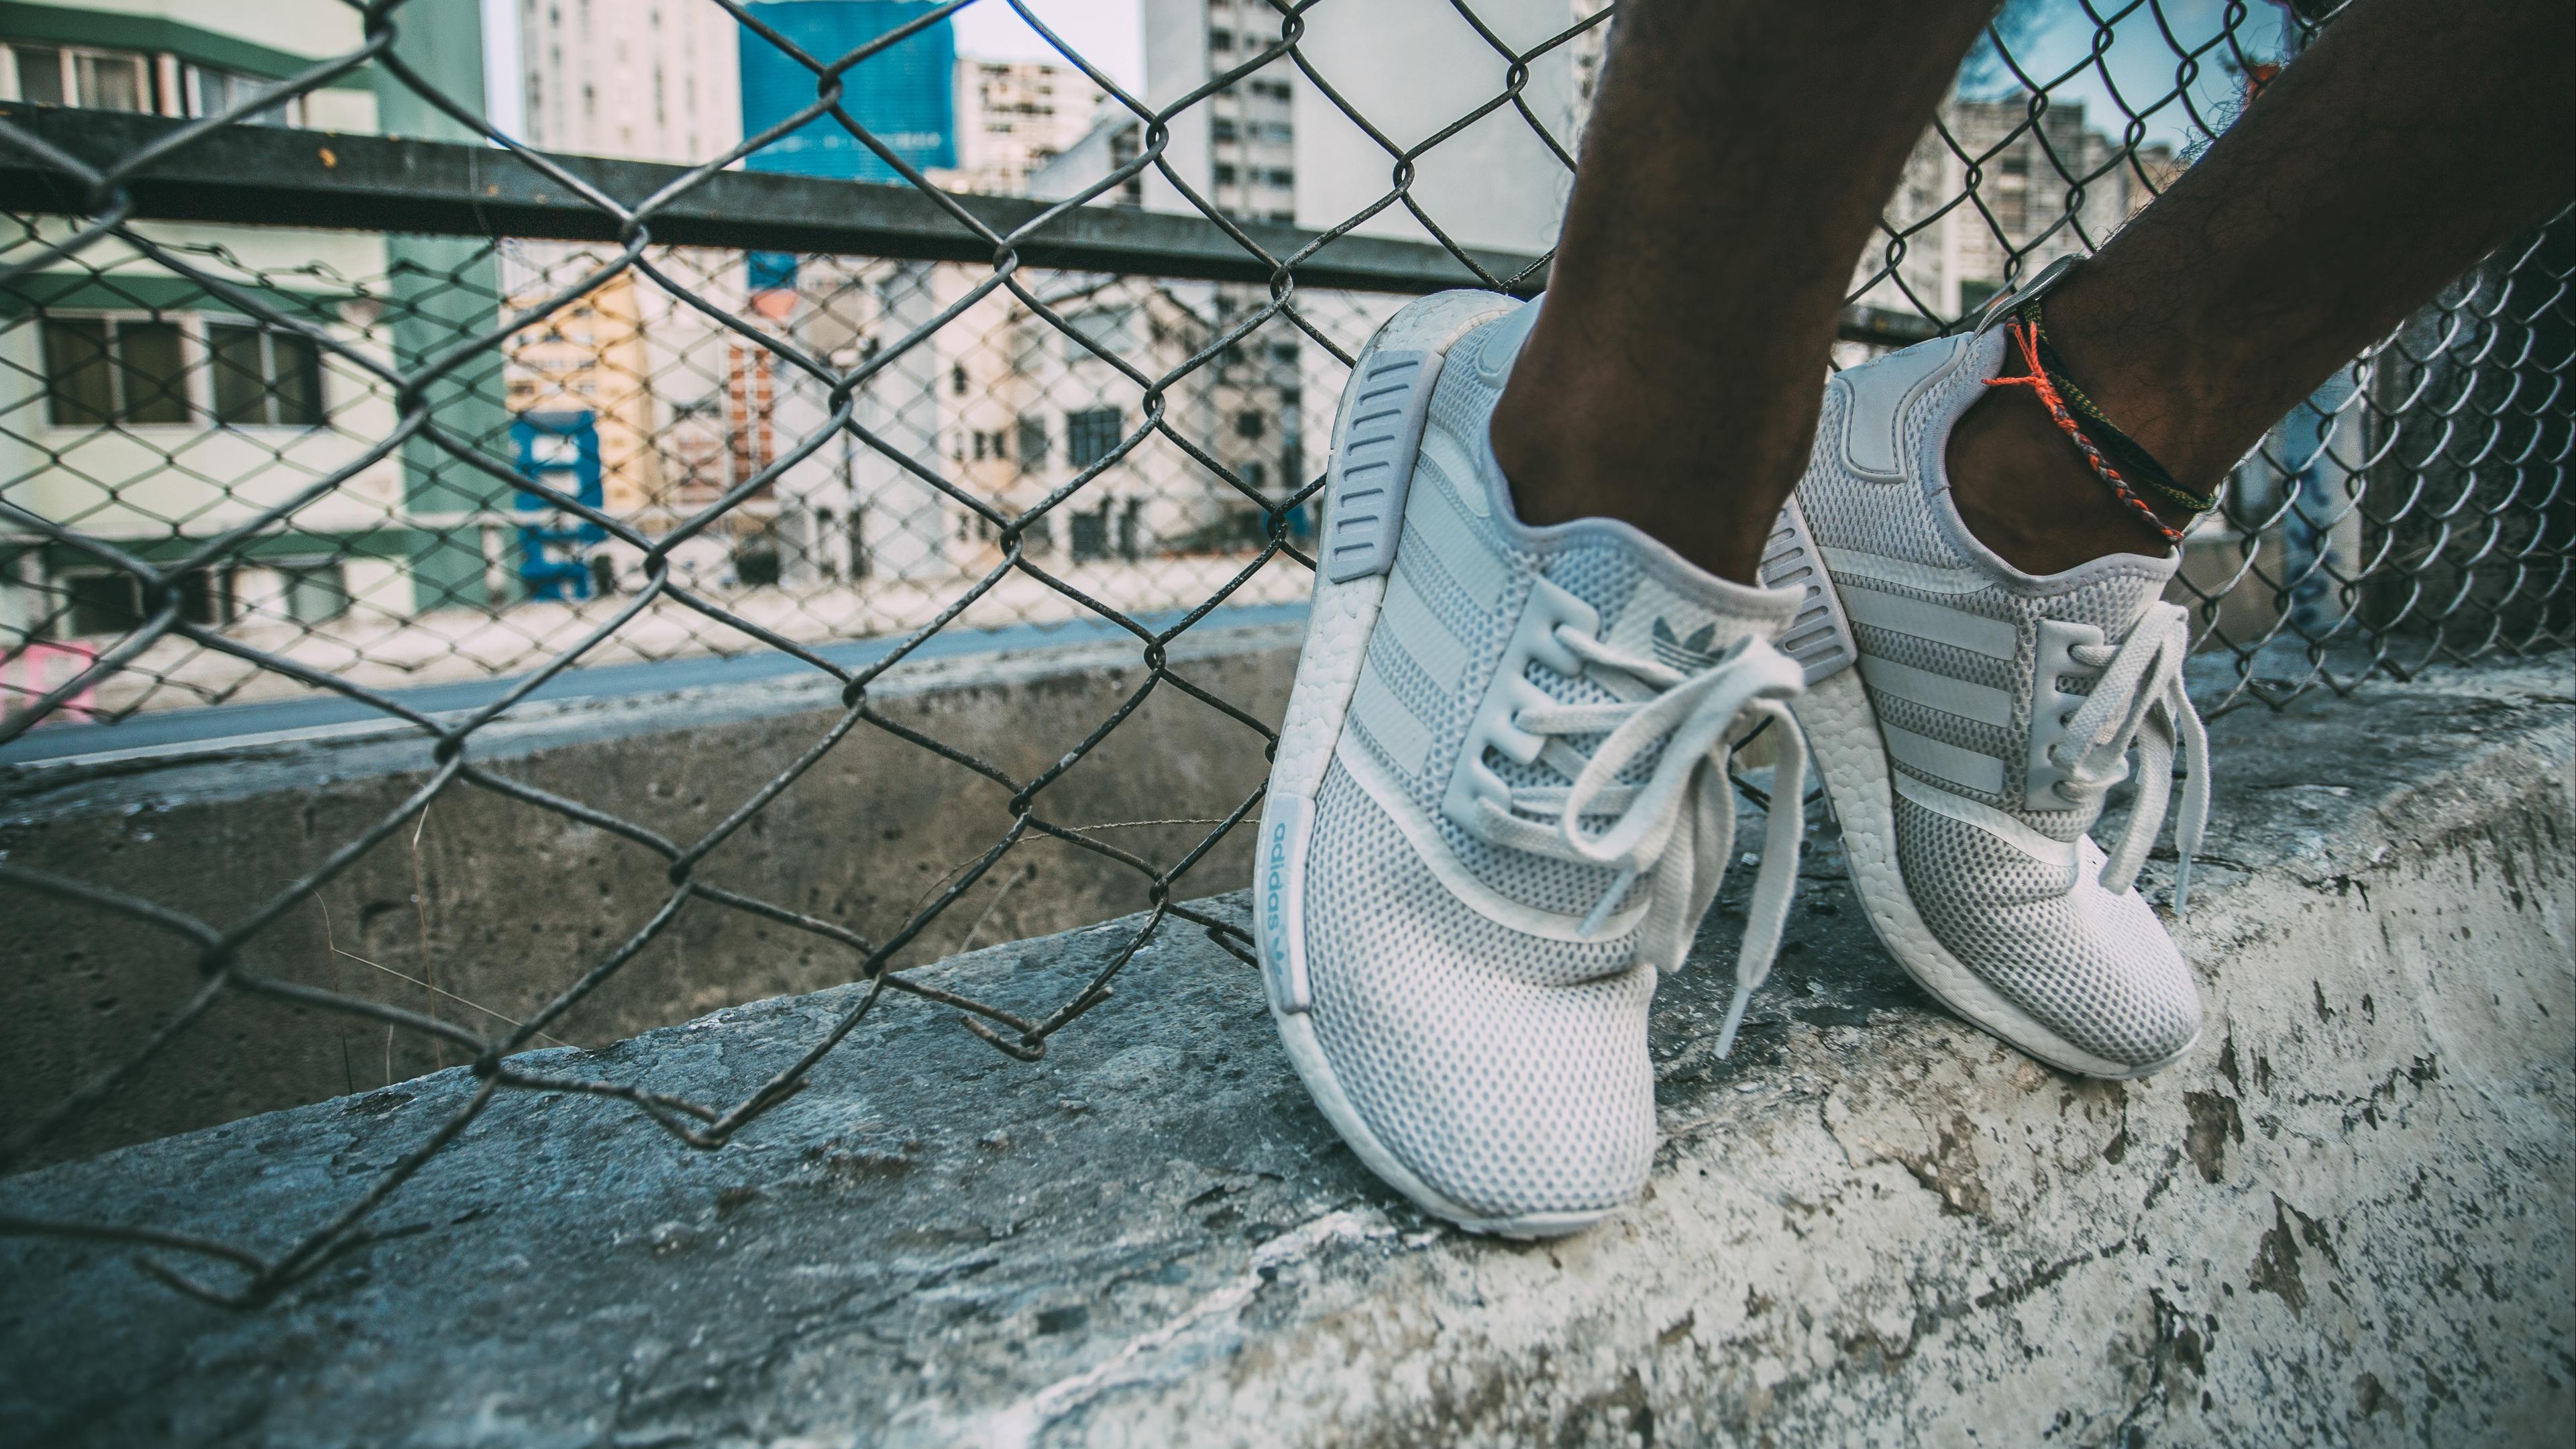 adidas sneakers sports 4k 1540061561 - adidas, sneakers, sports 4k - Sports, sneakers, Adidas